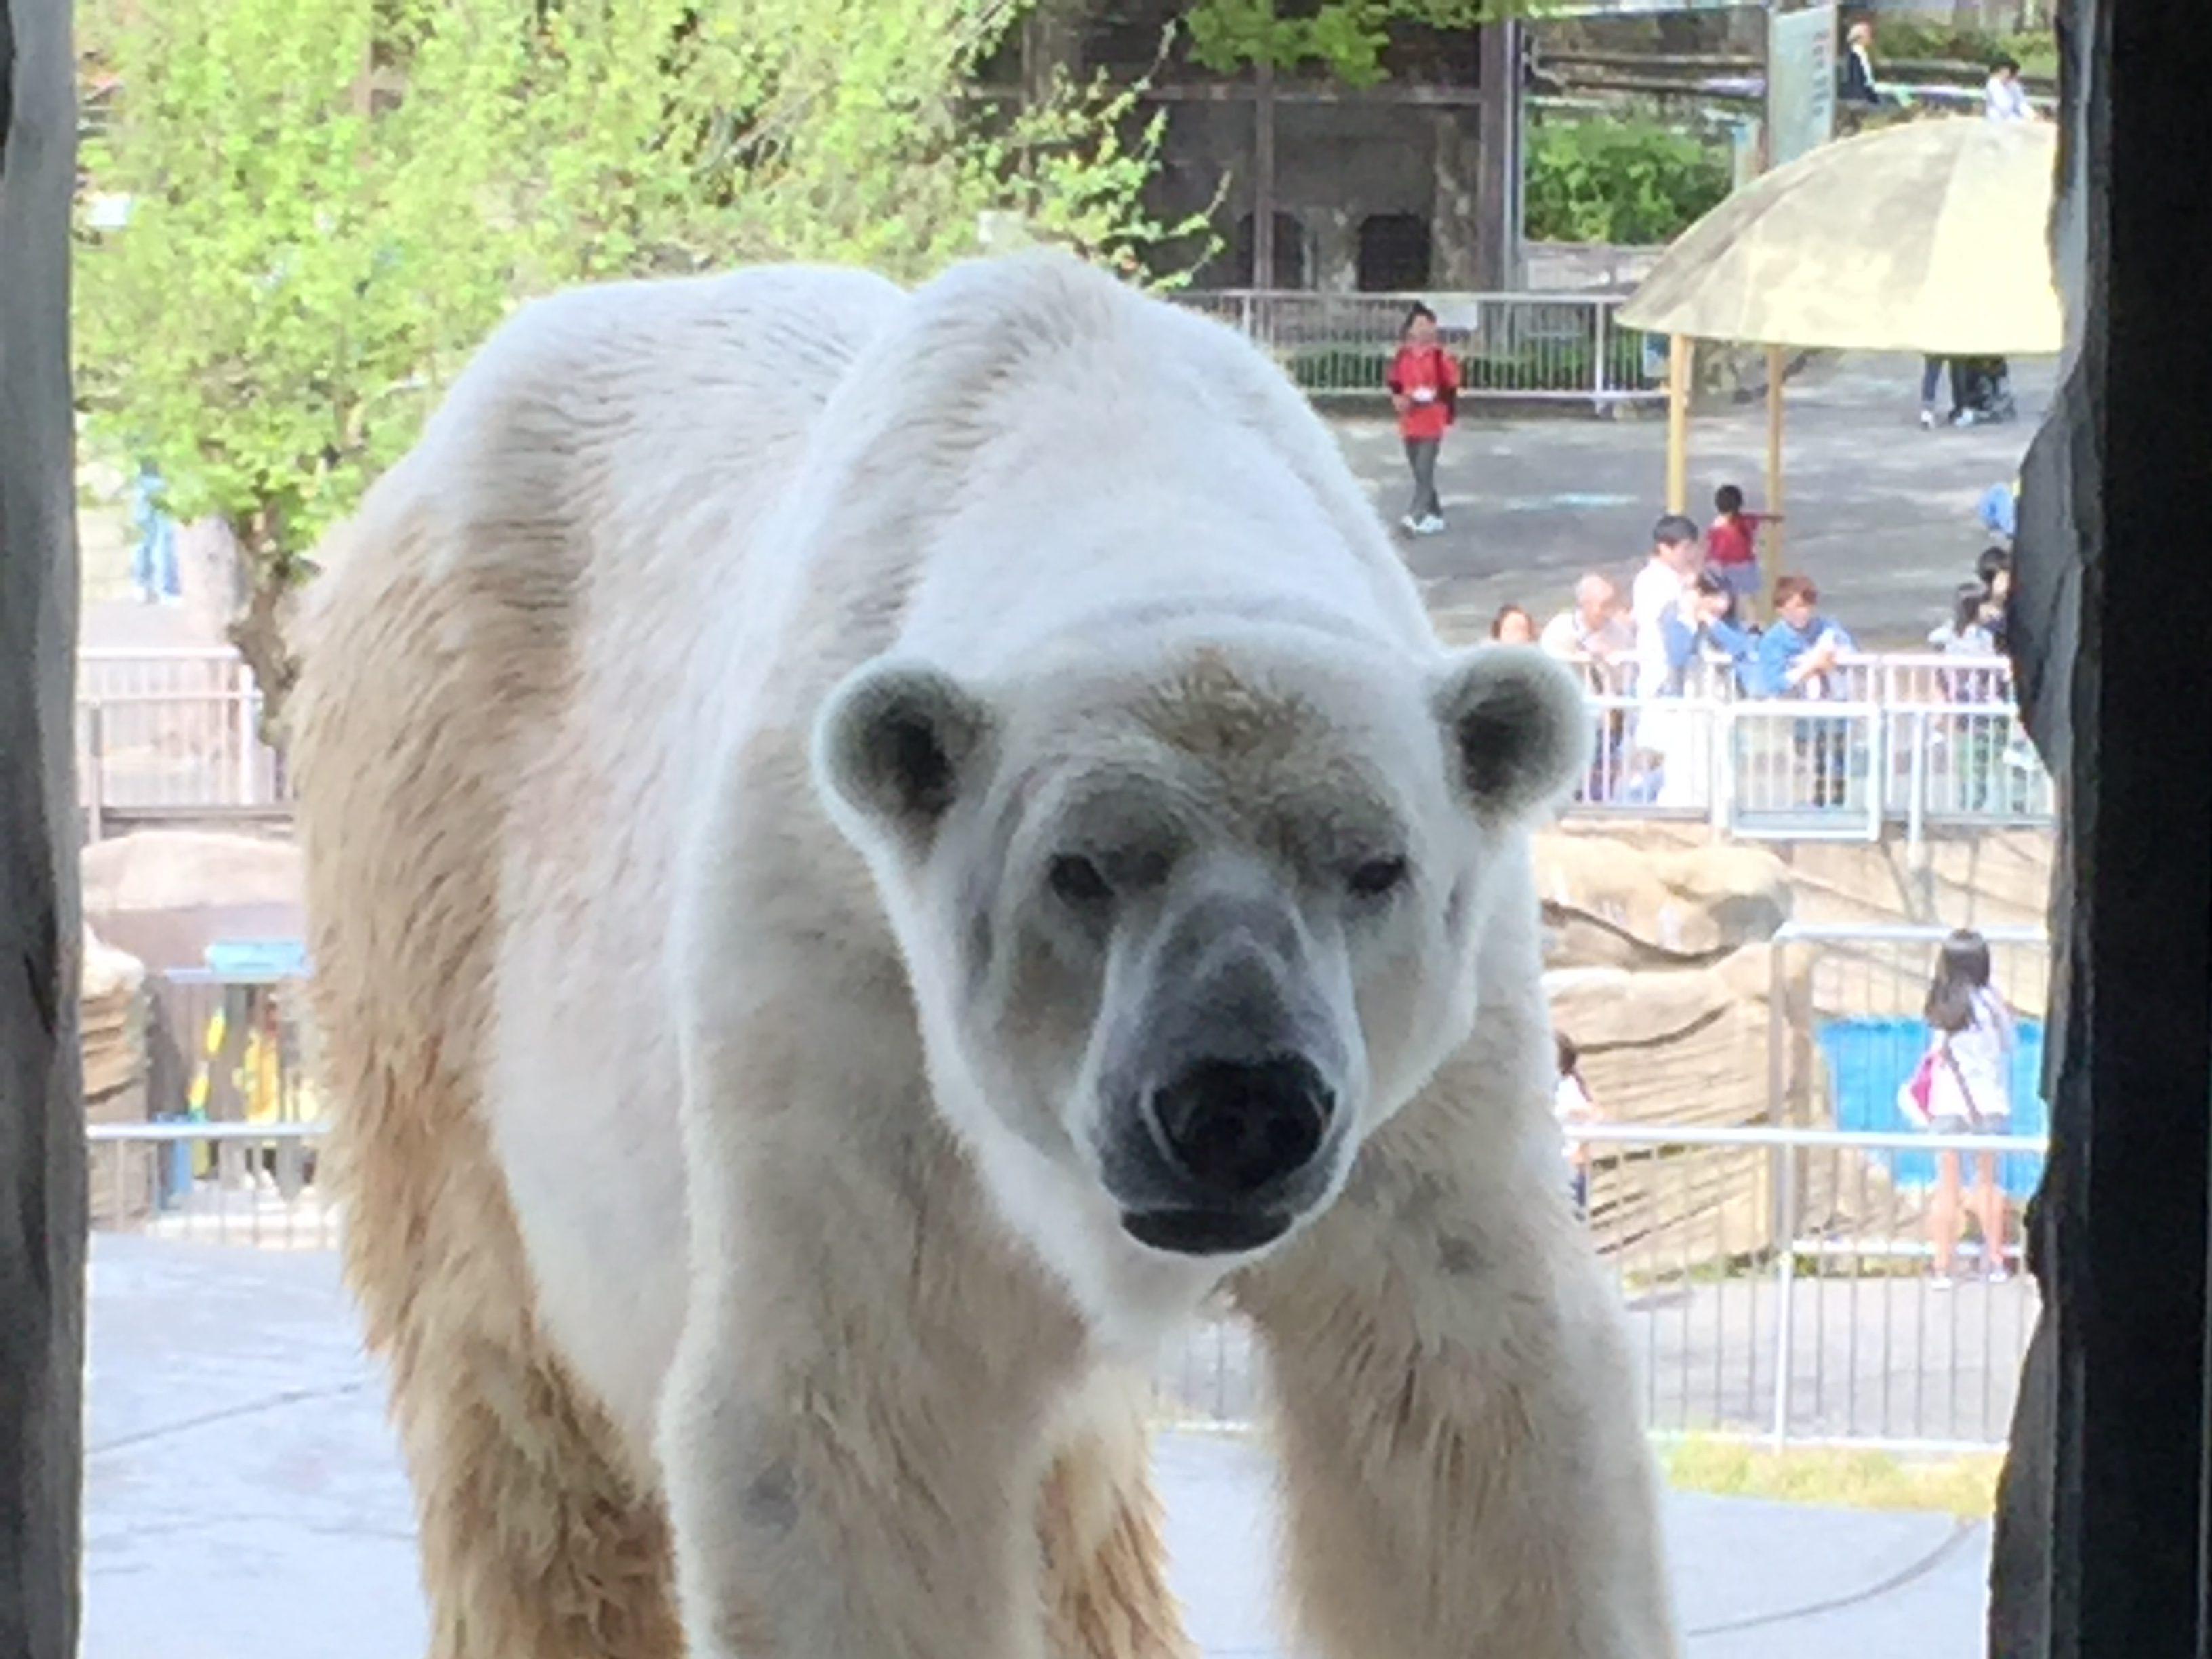 higashiyama-zoo-polarbear